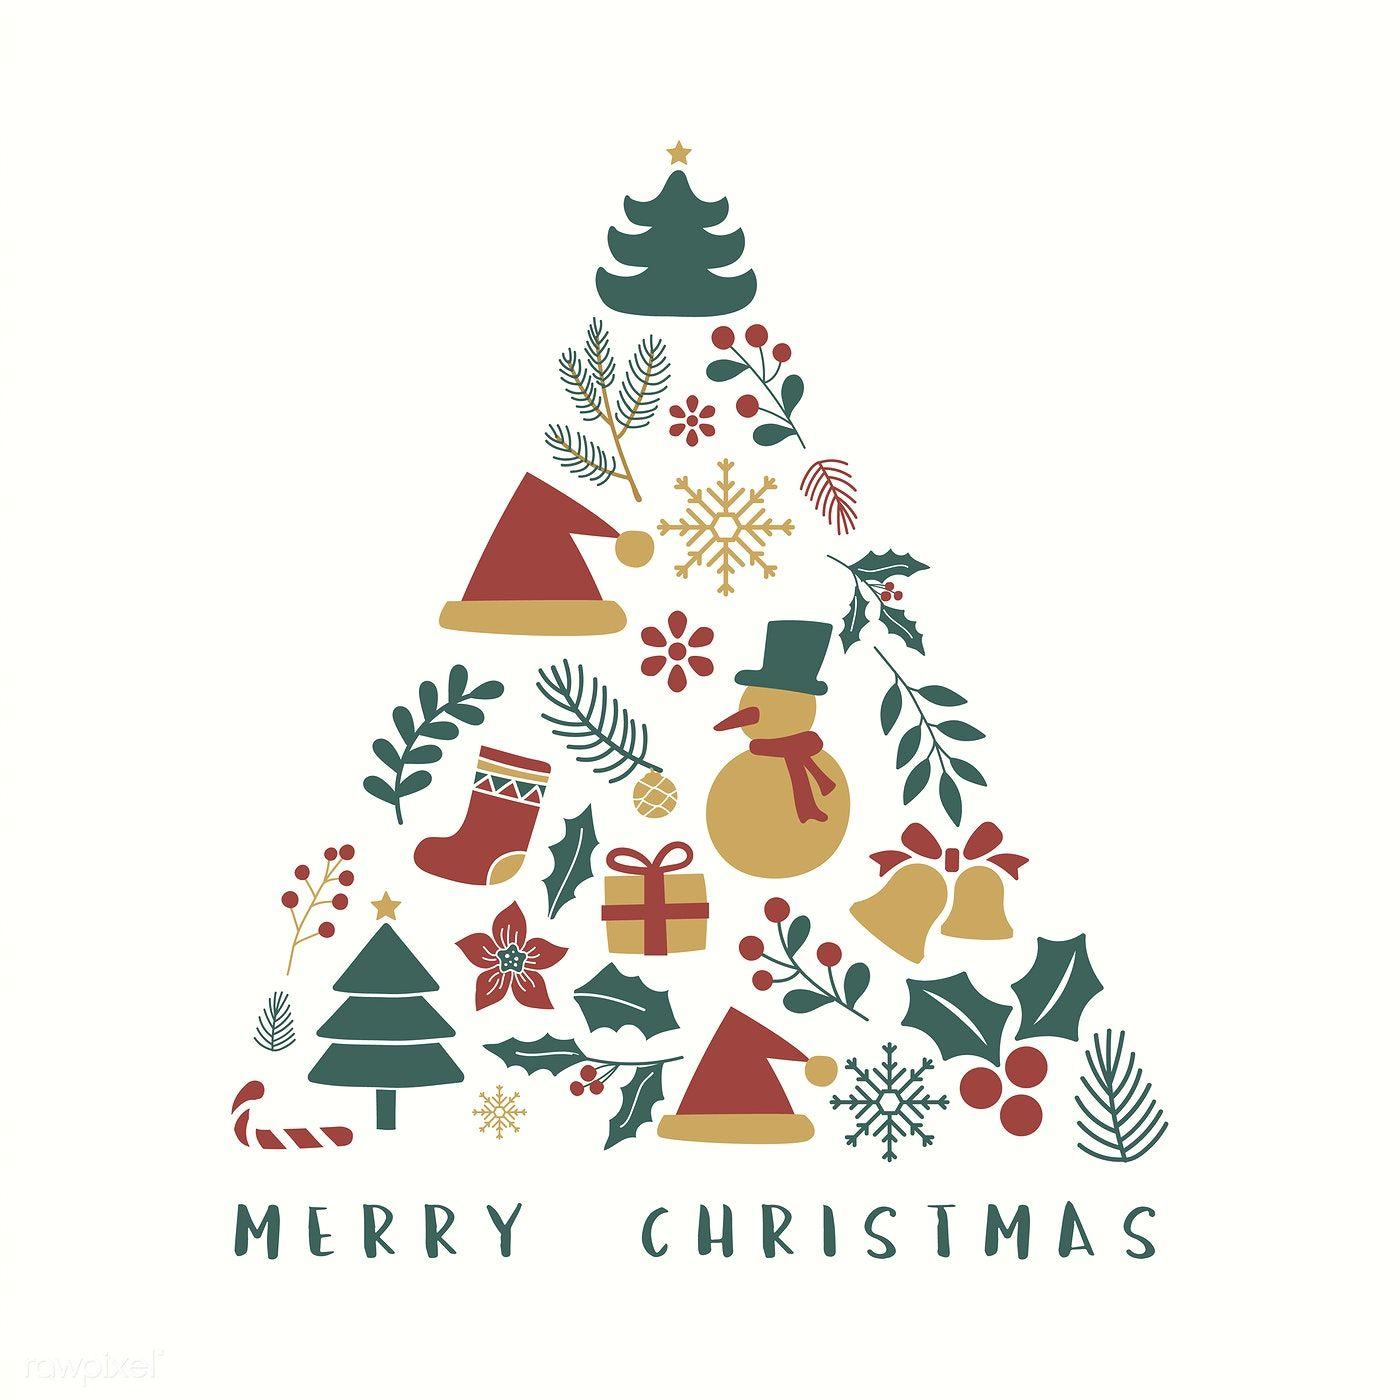 Download Premium Vector Of Illustration Set Of Christmas Decorations 494336 Christmas Illustration Design Christmas Greetings Free Christmas Greetings